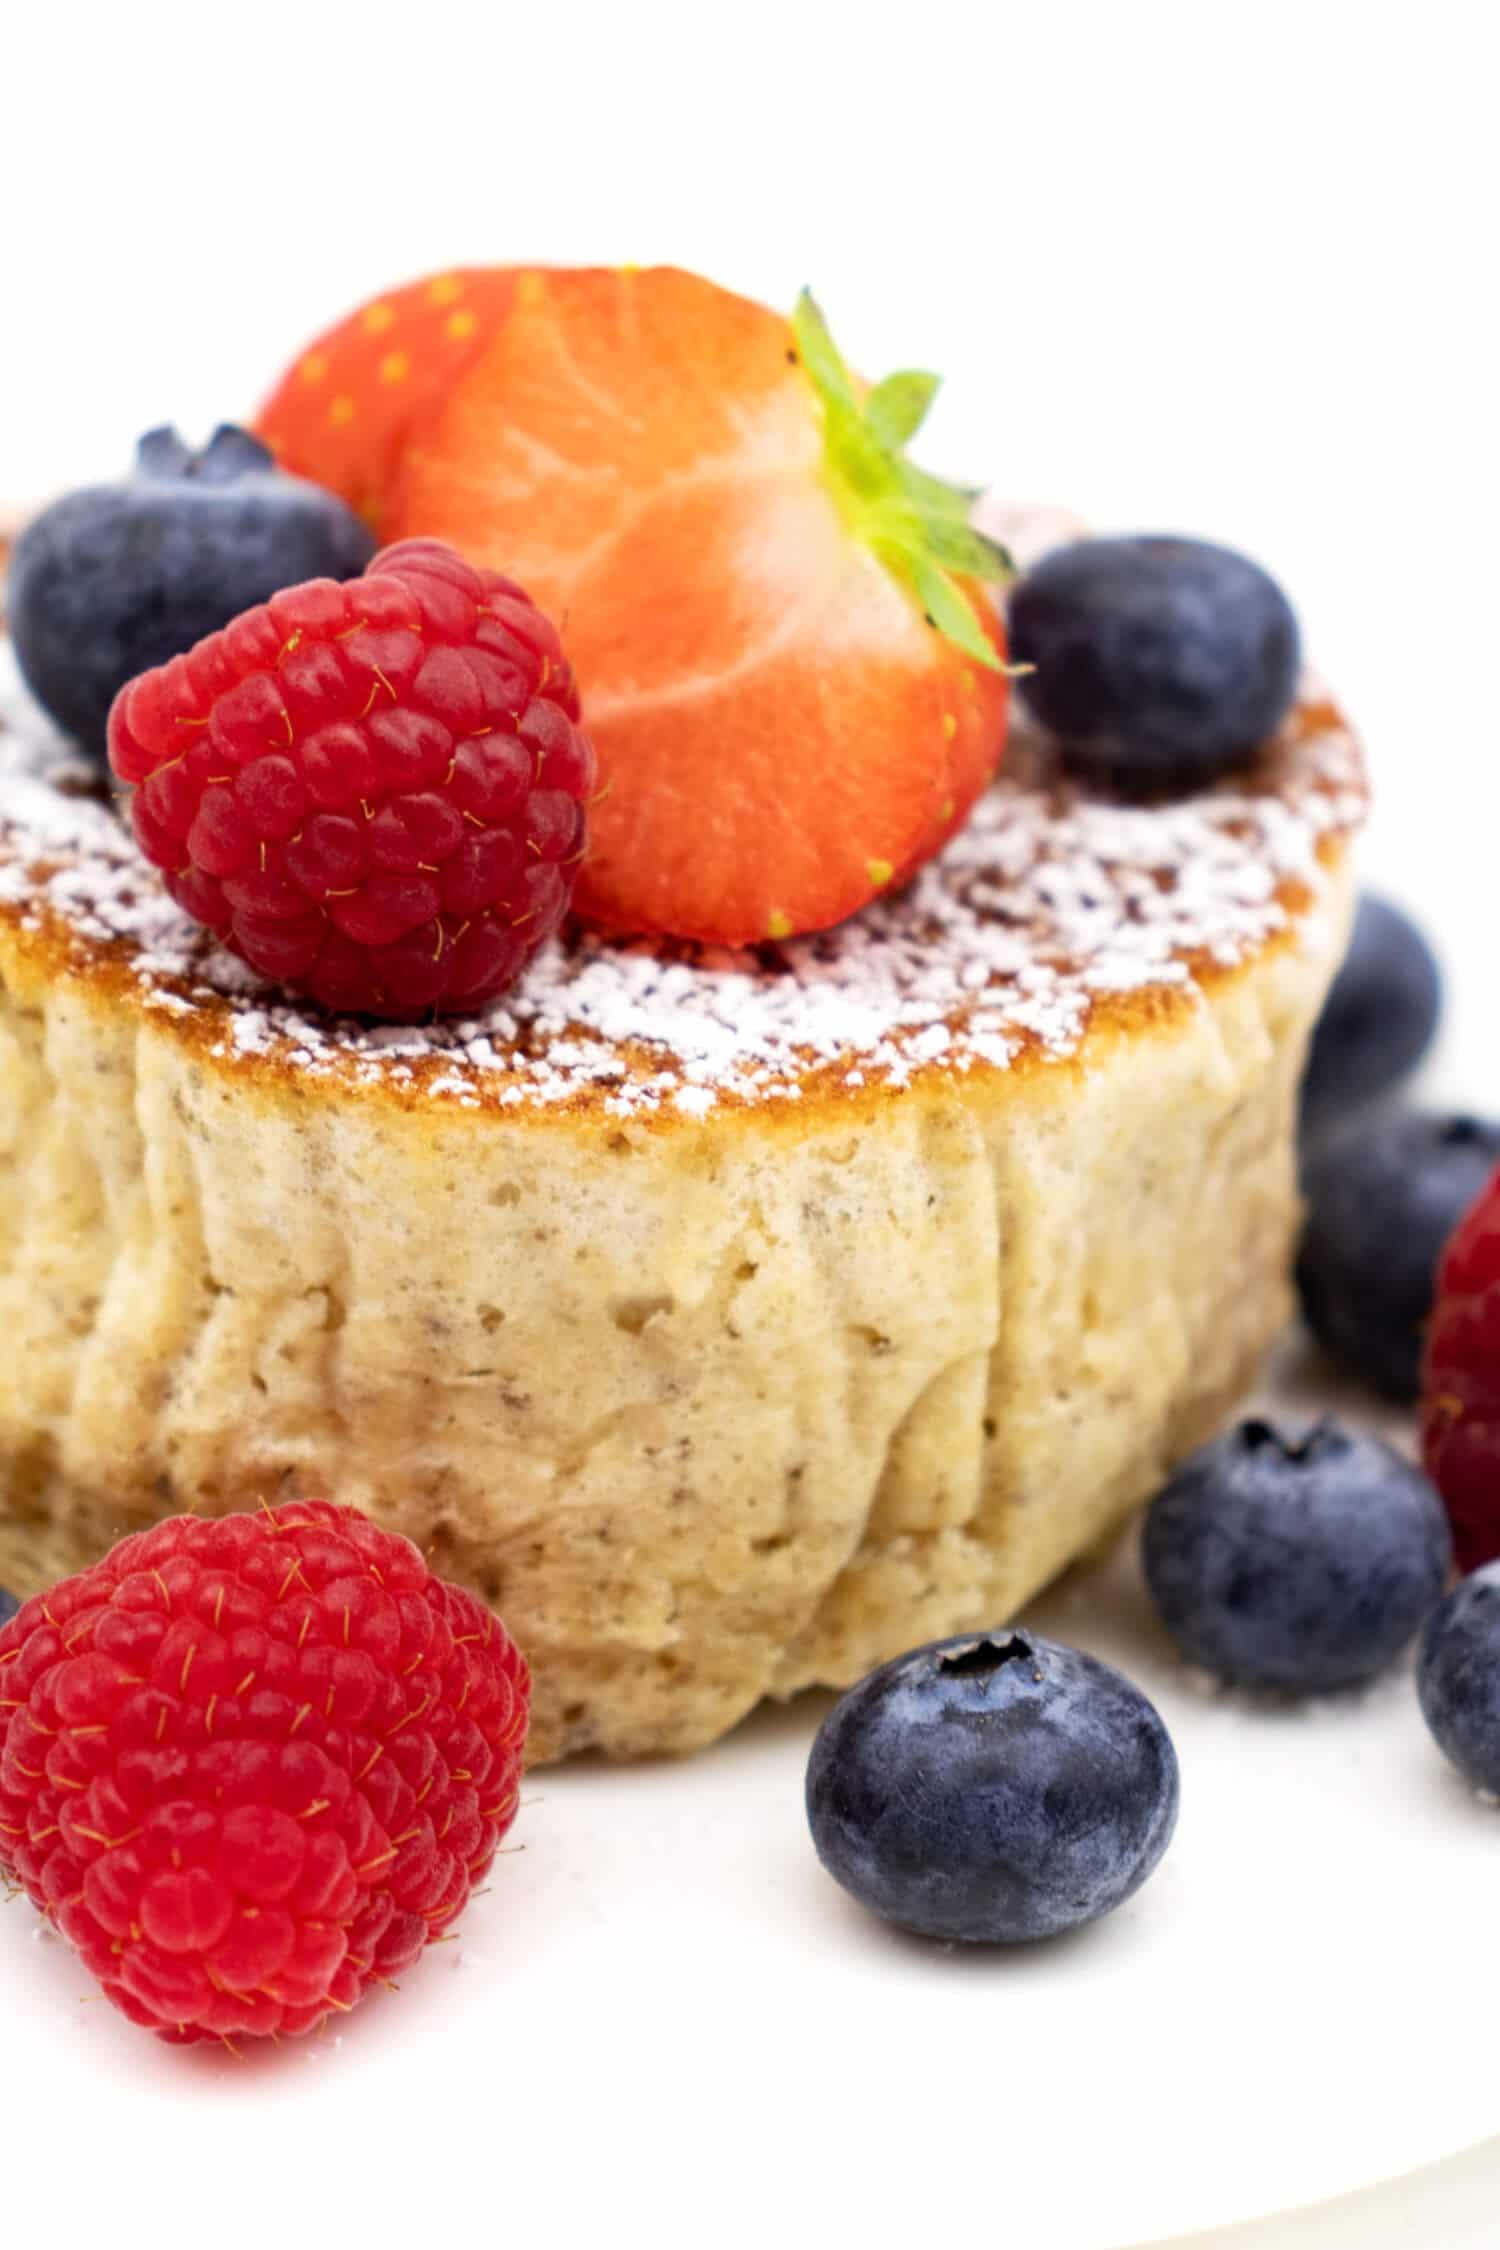 Rezept für gesunde Pancakes ohne Kohlenhydrate